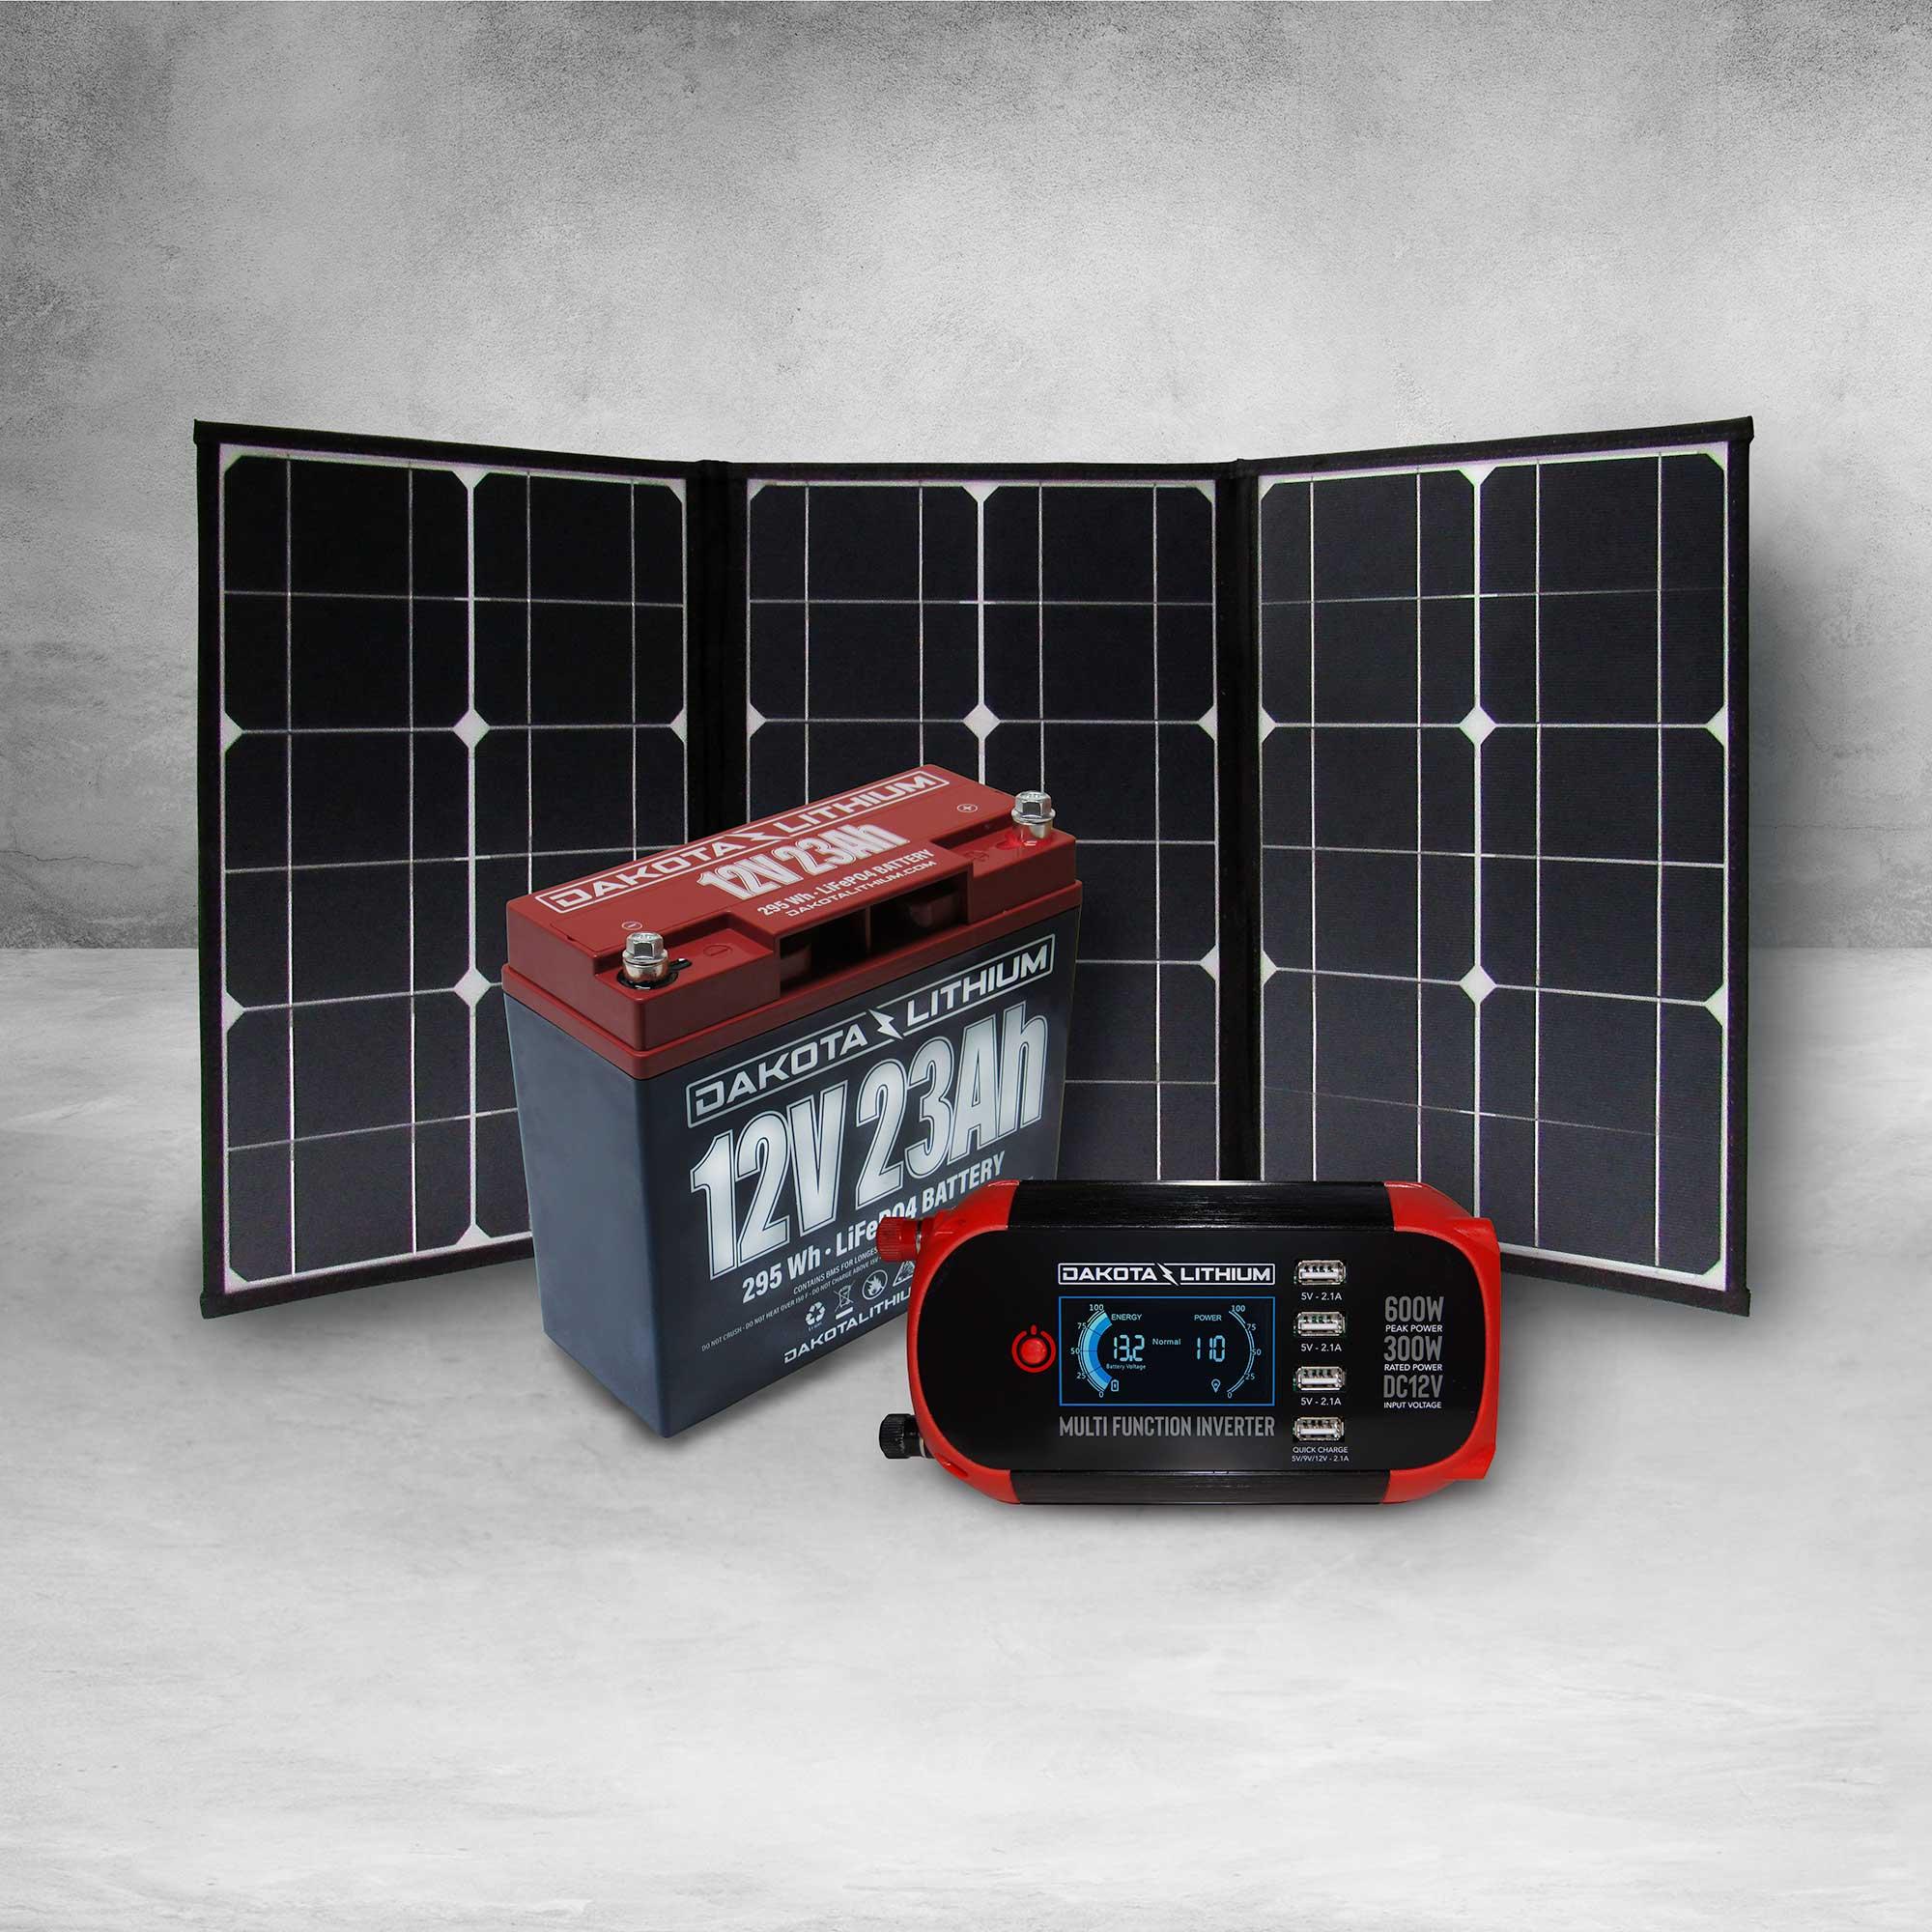 Dakota Lithium 12v 23Ah Off-Grid Power System